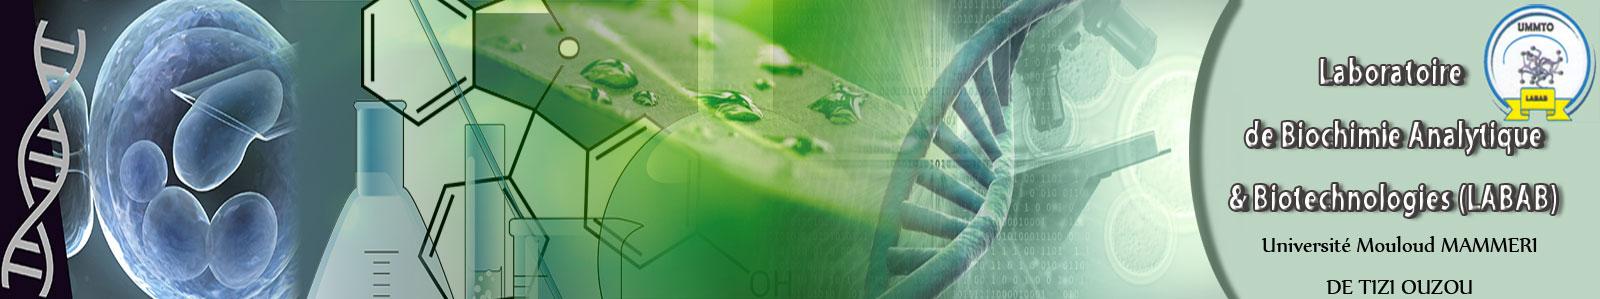 Laboratoire de Biochimie Analytique & Biotechnologies